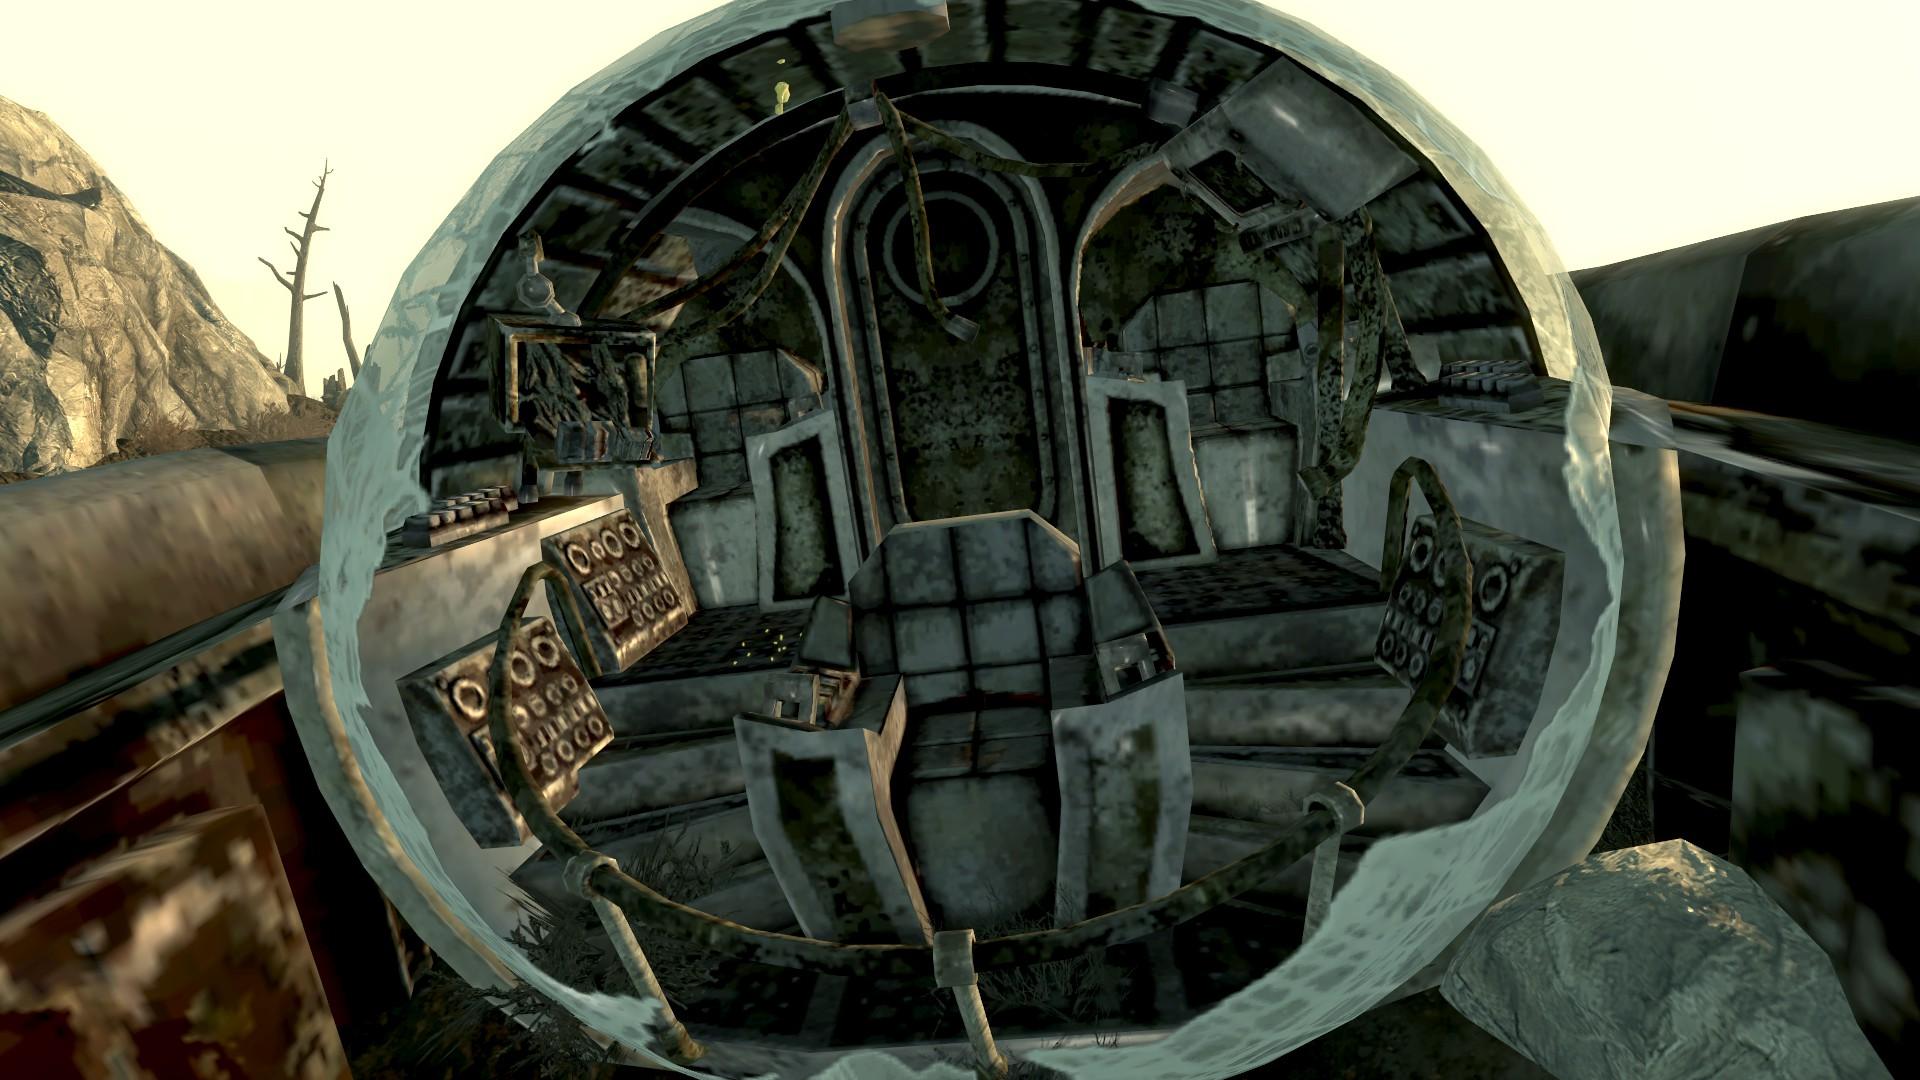 Alien crash site2